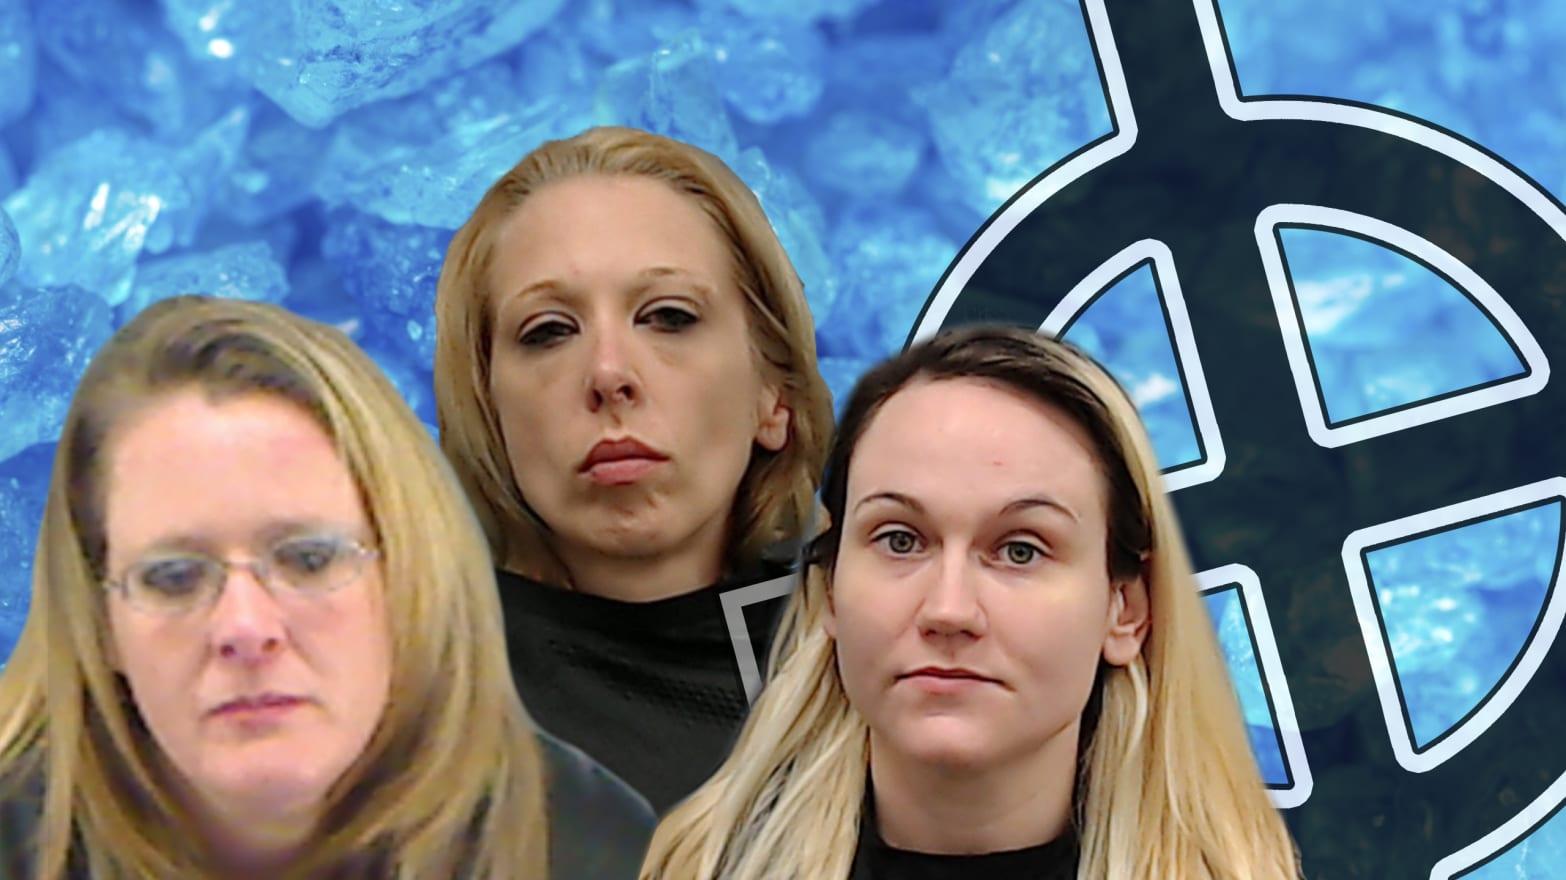 Feds: Aryan Brotherhood Meth Ring Was Run by Women